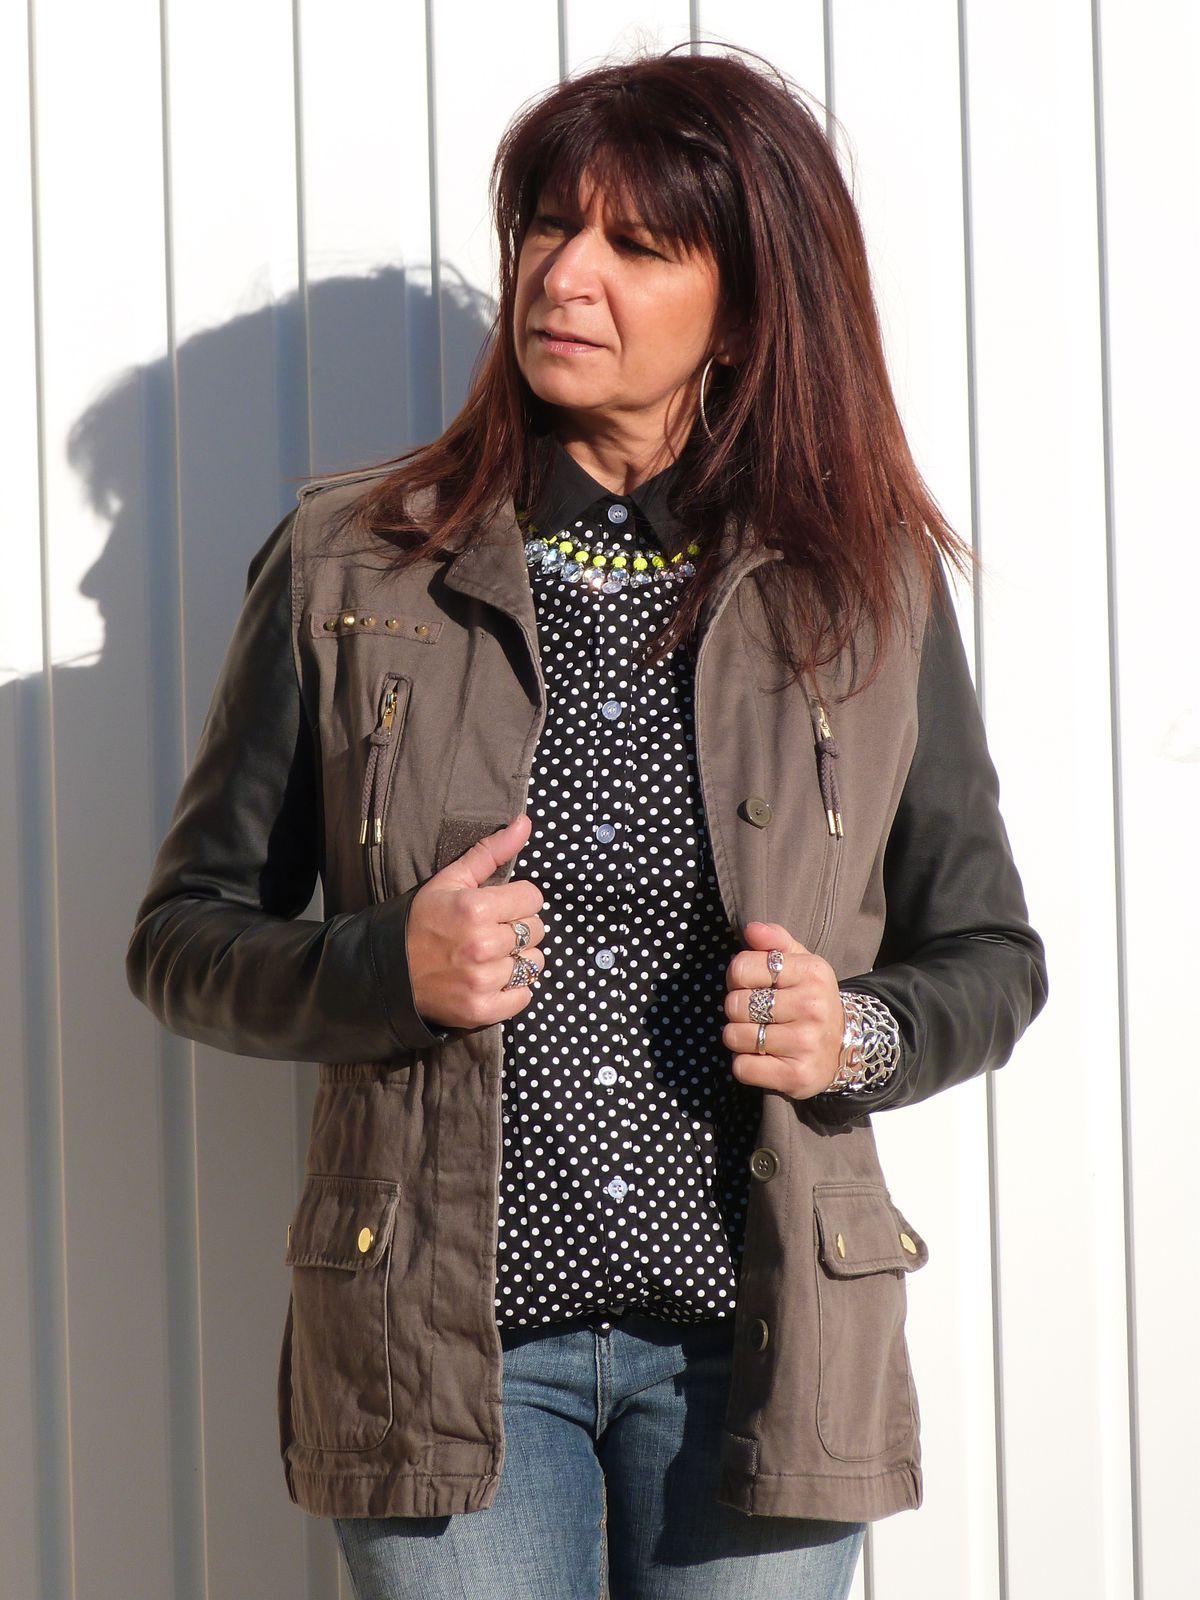 veste :PIMKIE   jeans : BERSHKA  chemisier : JOLLYCHIC  bottines: GEMO . collier : HetM.